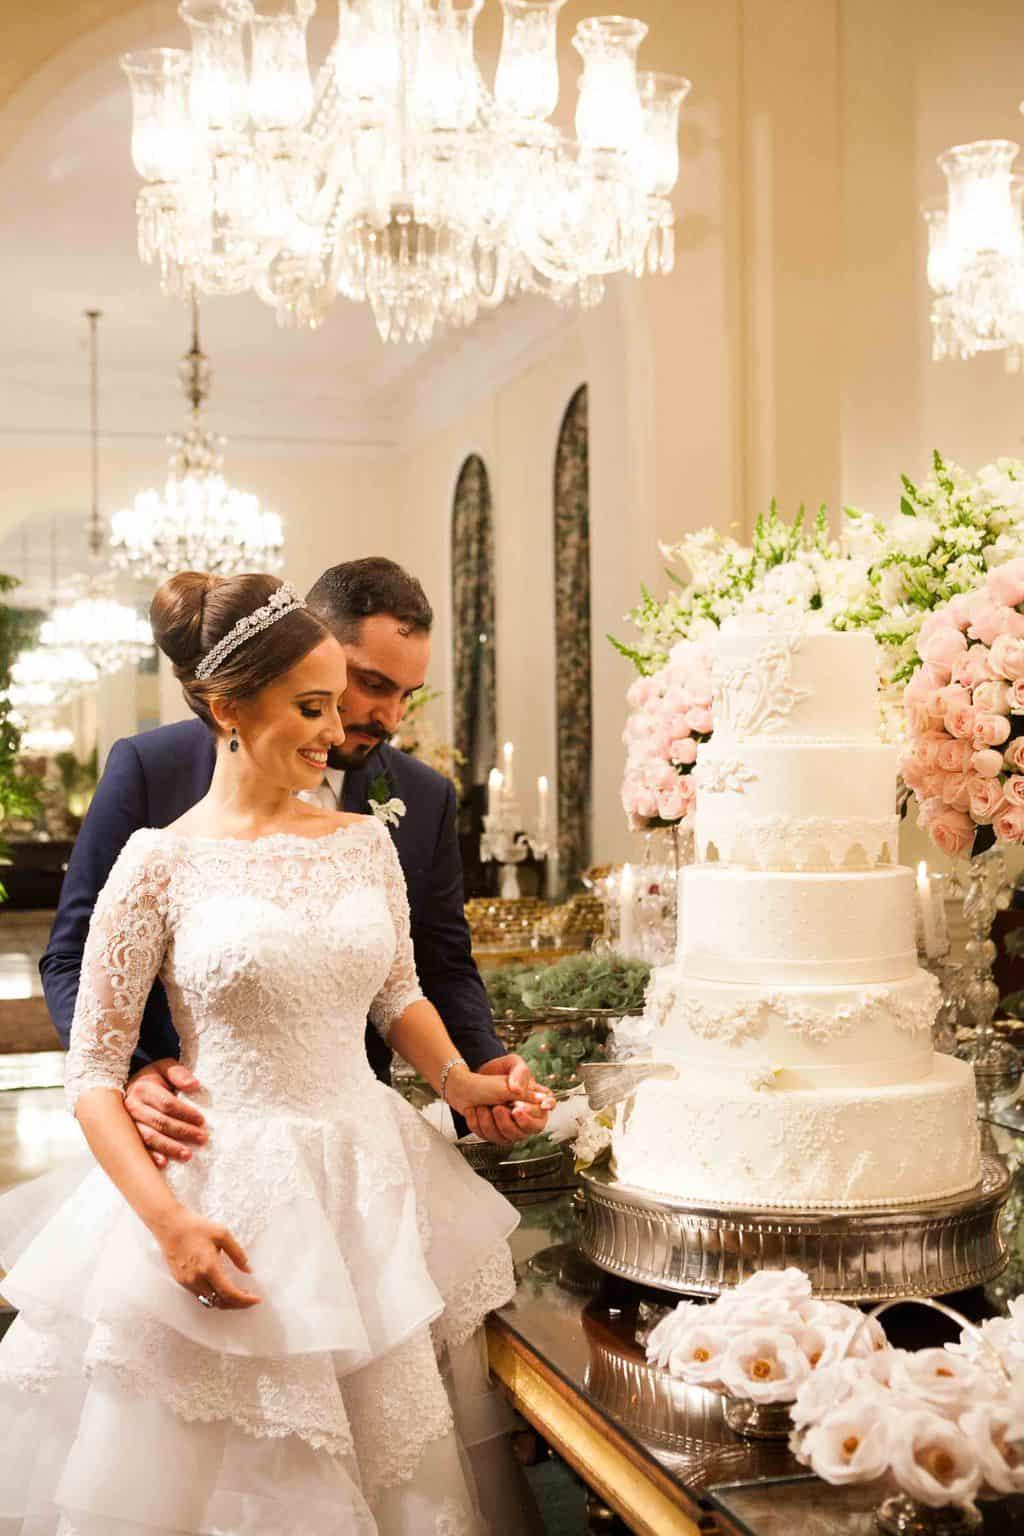 Casamento-Clássico-Casamento-tradicional-Copacabana-Palace-Corte-do-bolo-Monica-Roias-Ribas-Foto-e-Vídeo-Silvio-Cruz-Tuanny-e-Bernardo-CaseMe-2